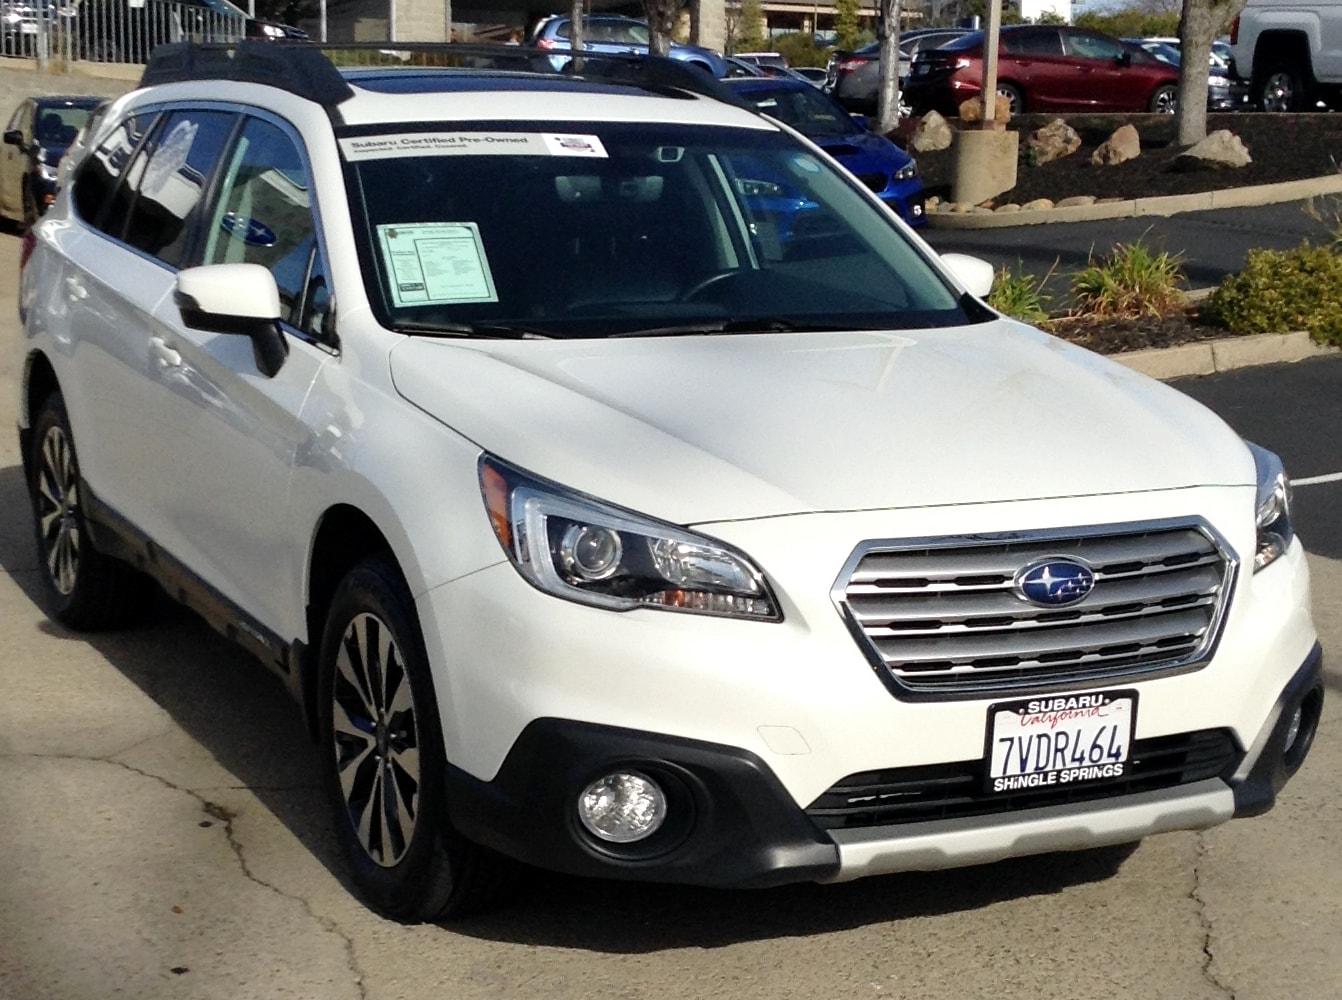 2017 Subaru Outback 3.6R Limited SUV